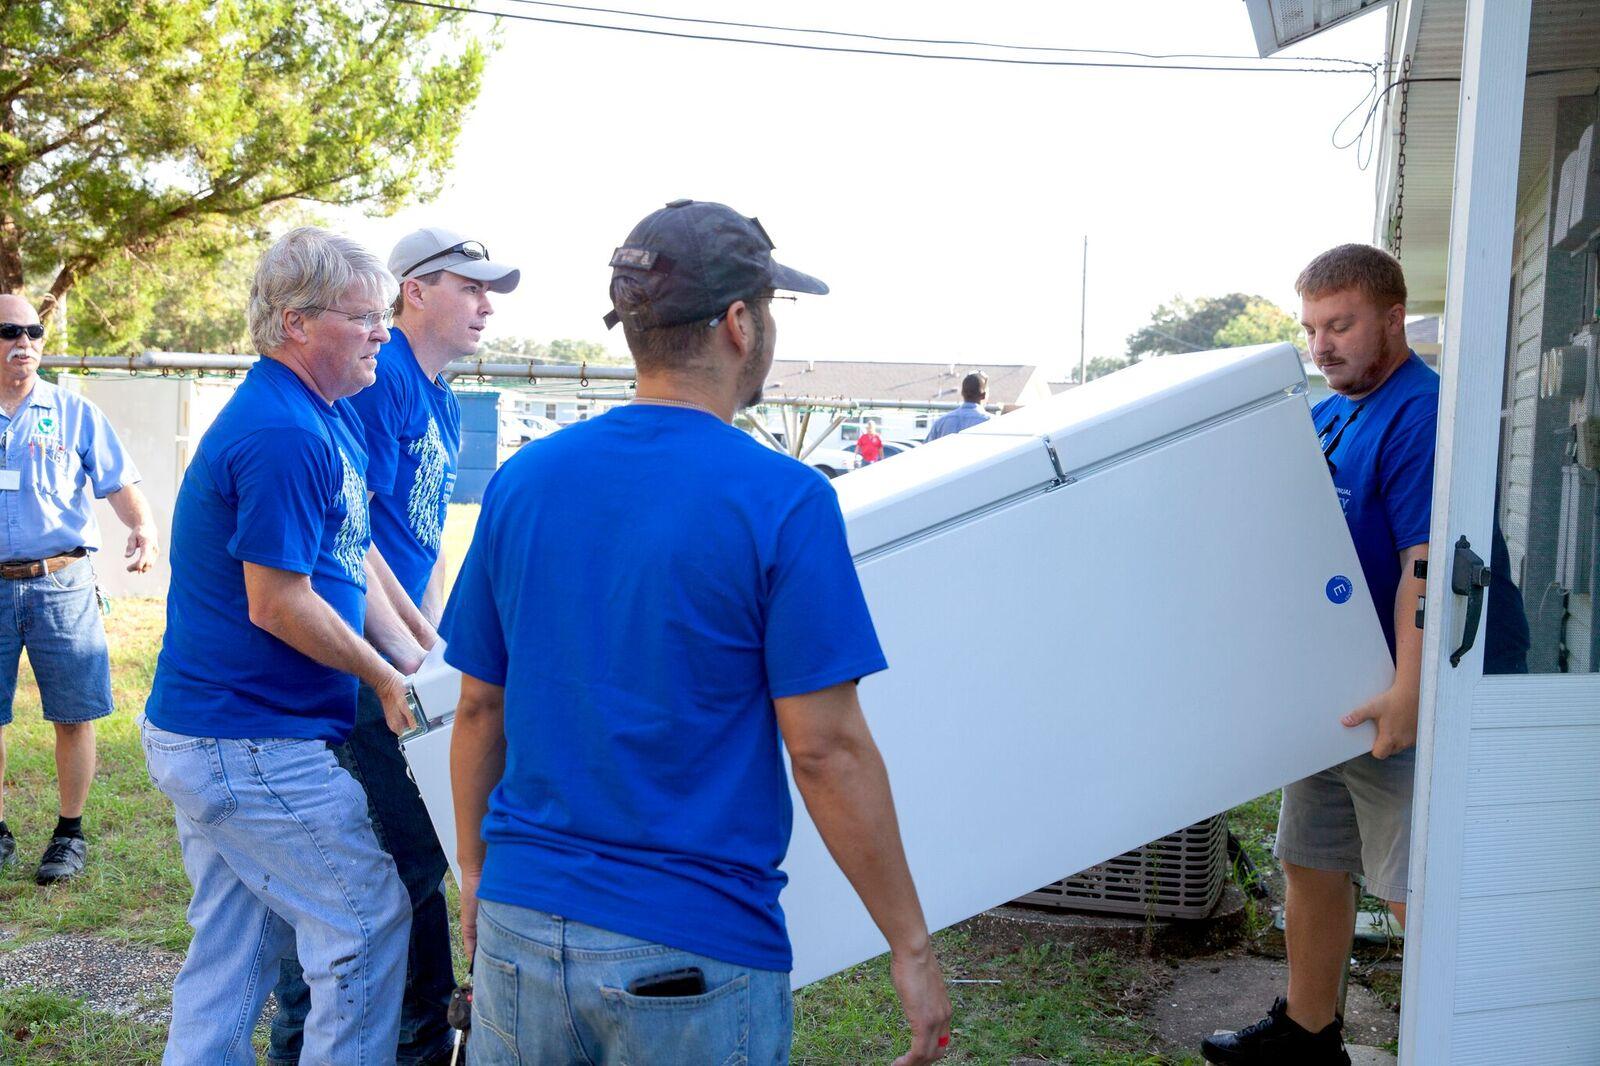 Securadyne volunteers carrying refrigerators into apartments at Moreno Court